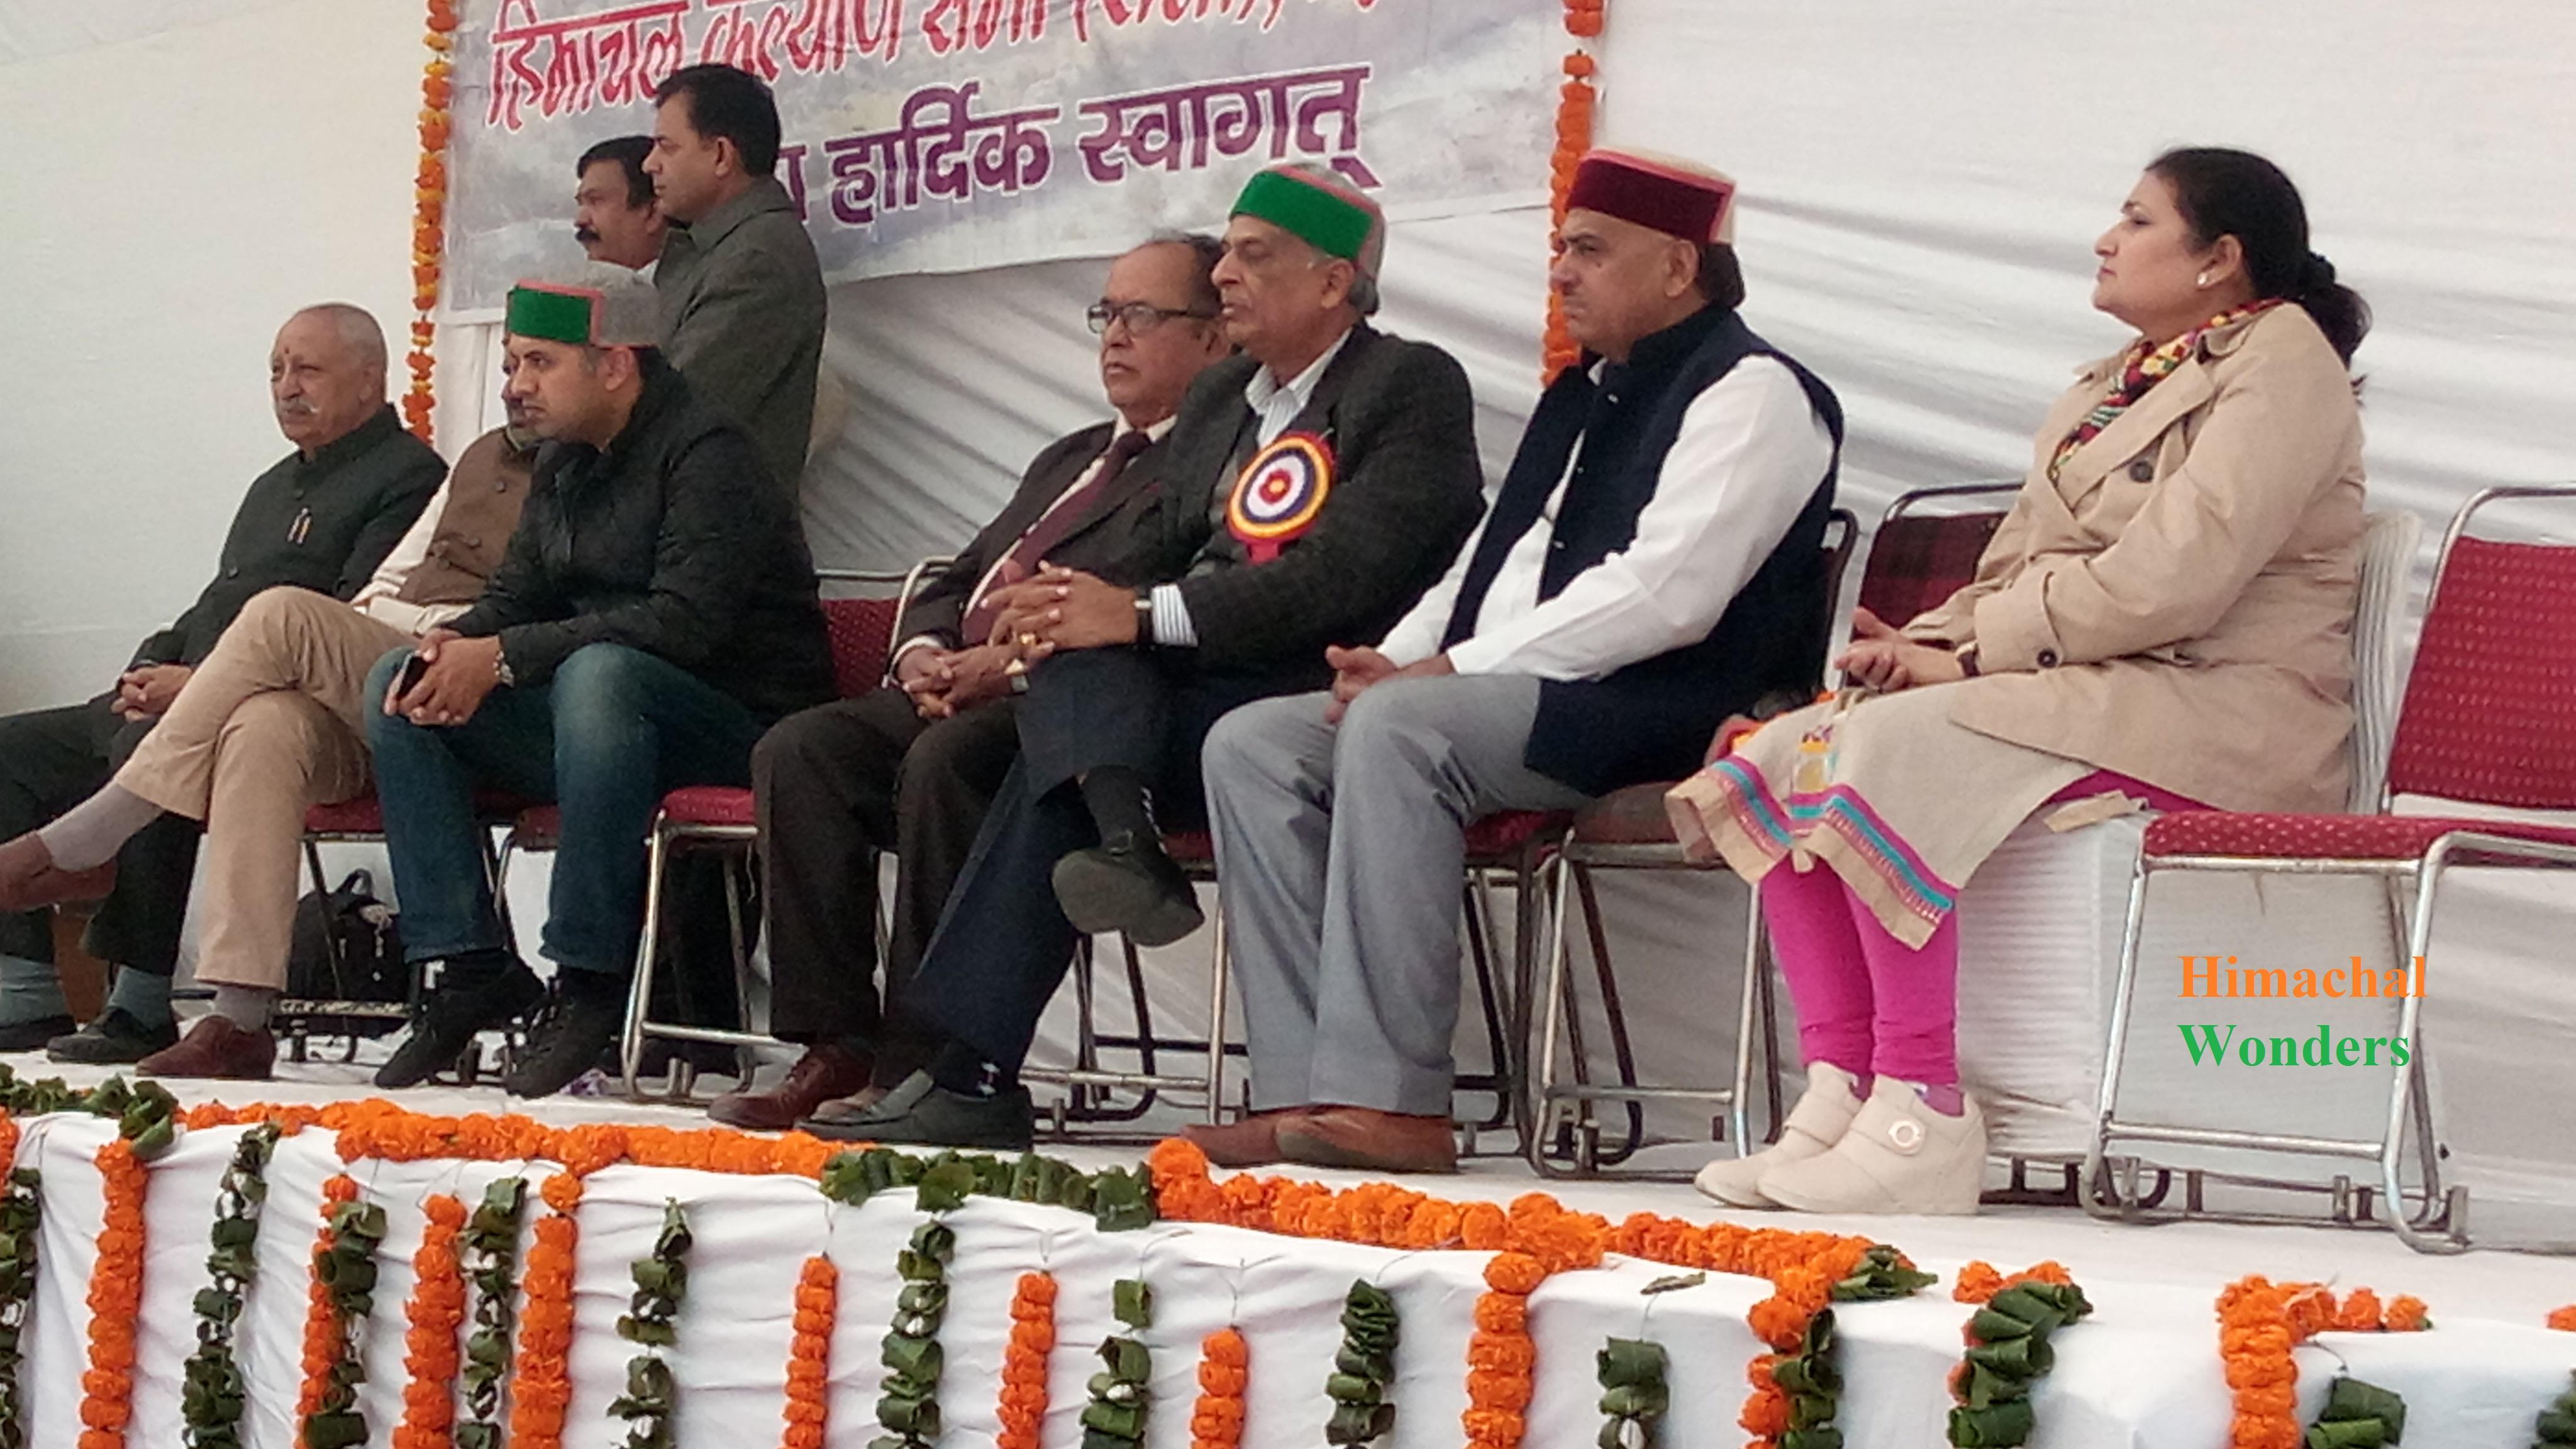 Himahal Kalyan sabha delhi 2017